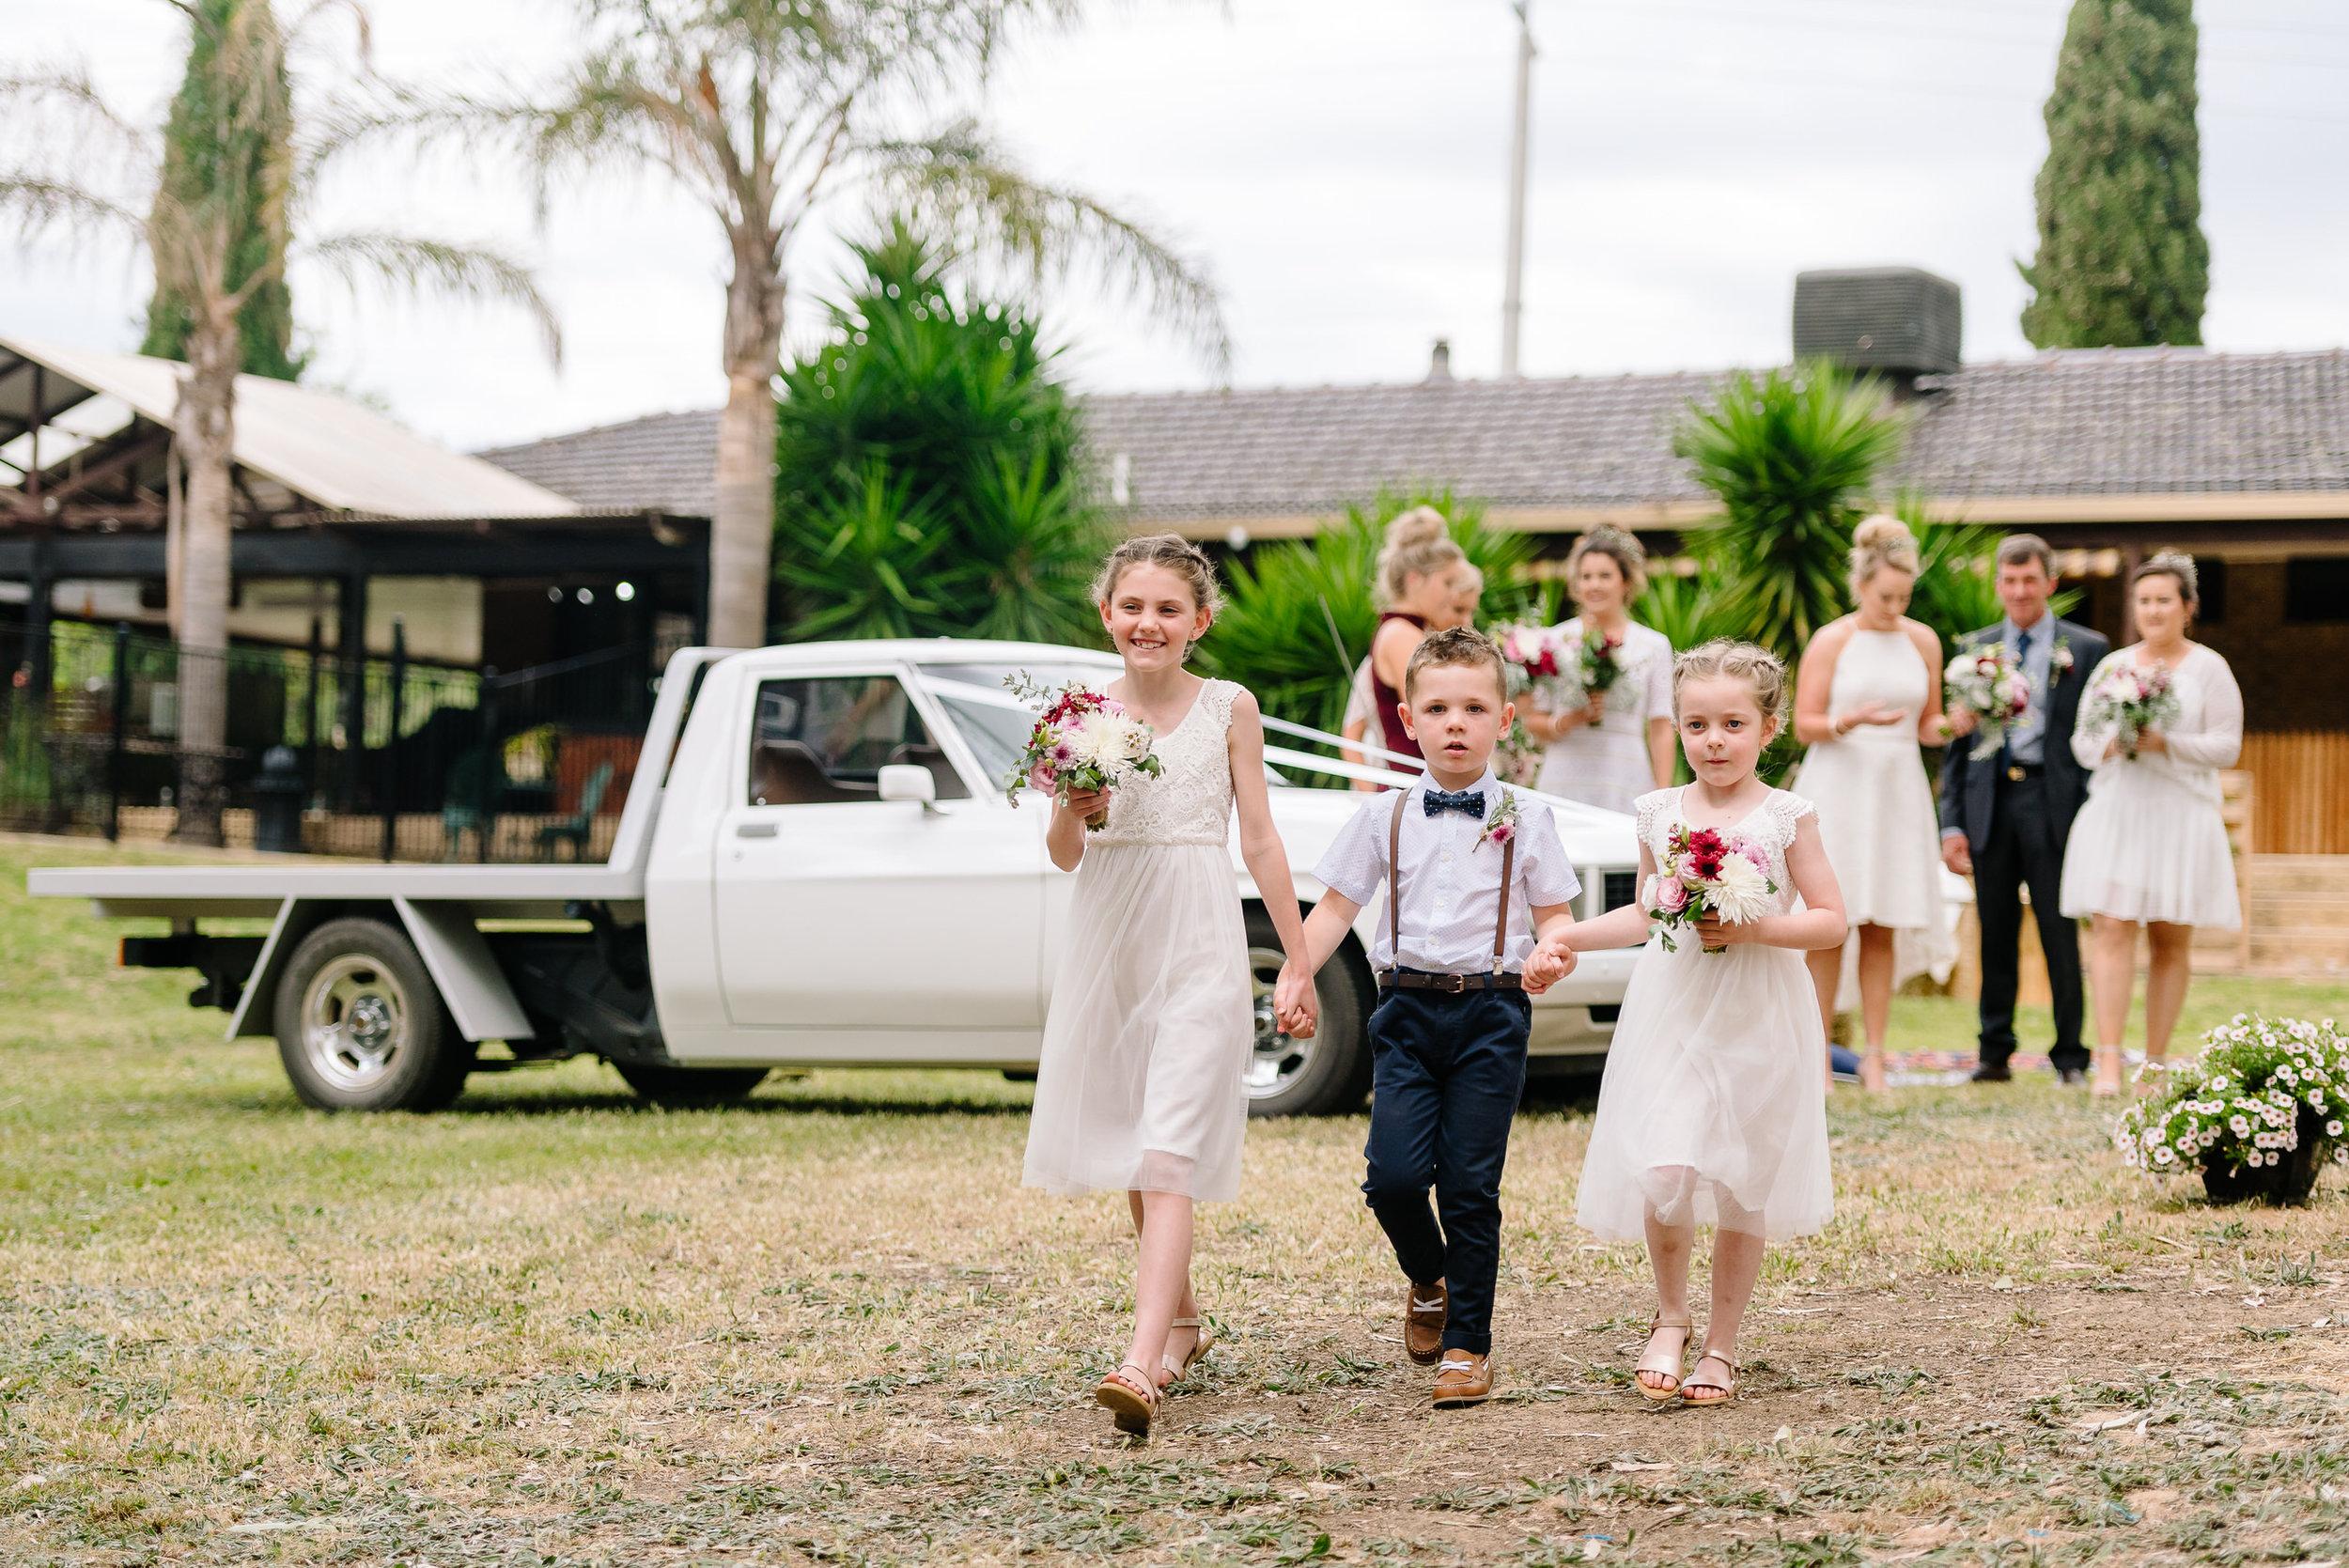 Justin_And_Jim_Photography_Backyard_Wedding165.JPG